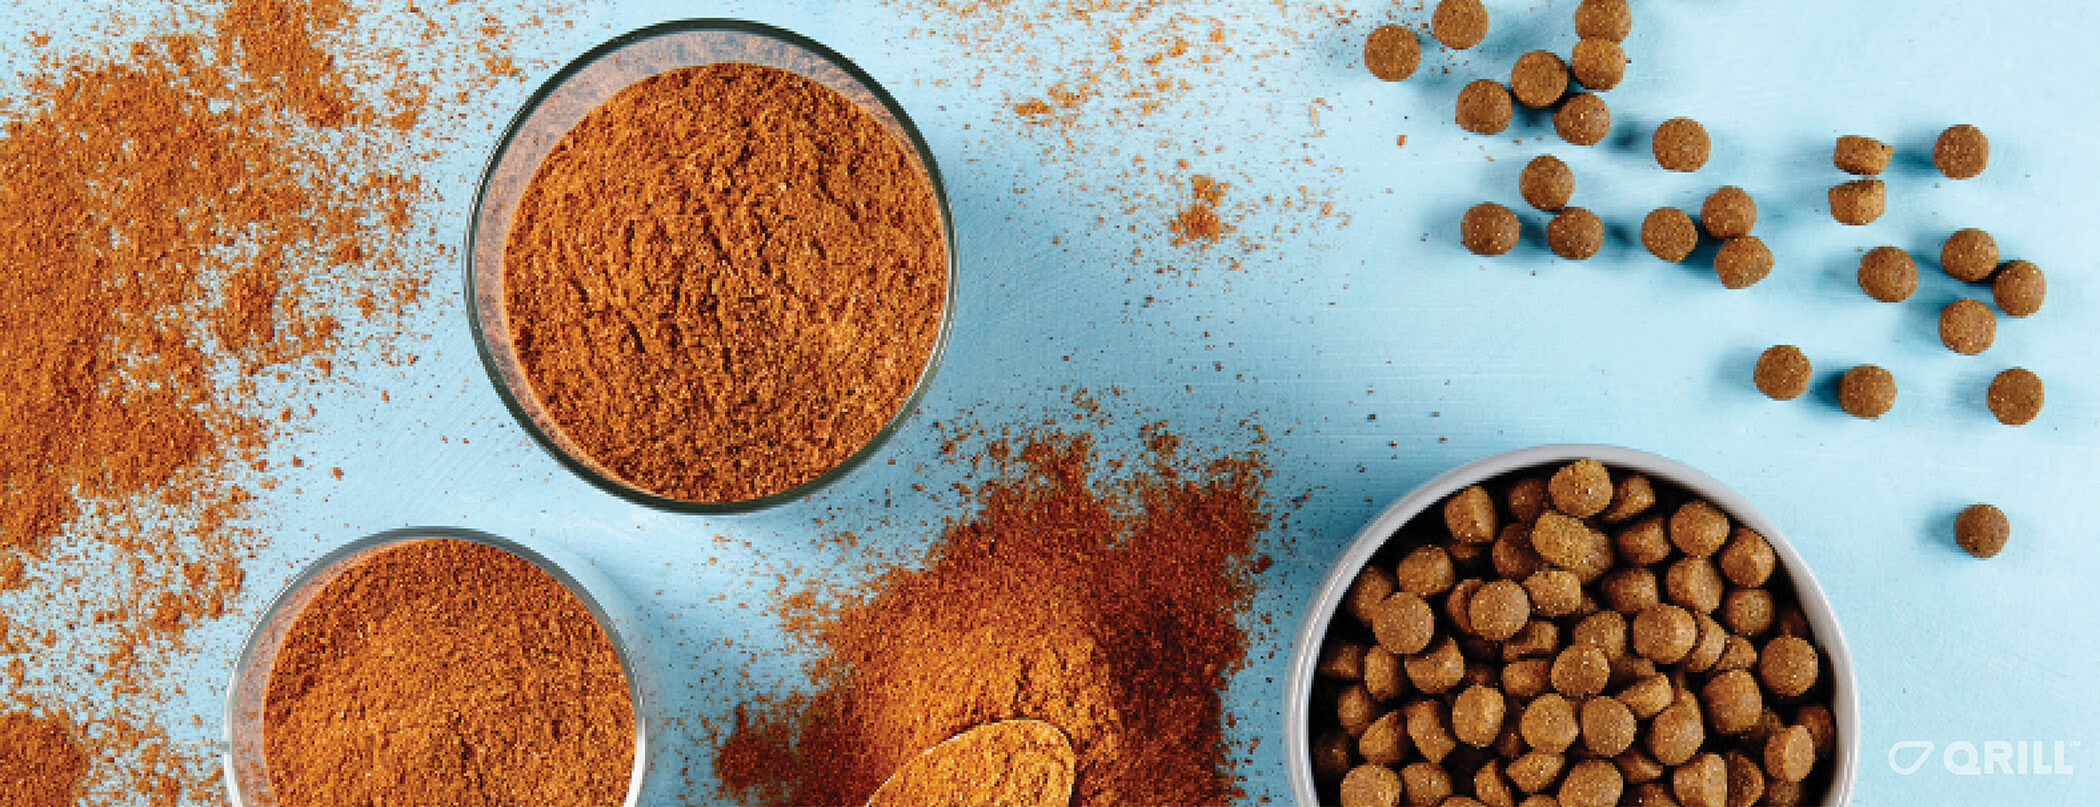 QRILLPet Product Krill Ingredient Pet Food -B.jpg